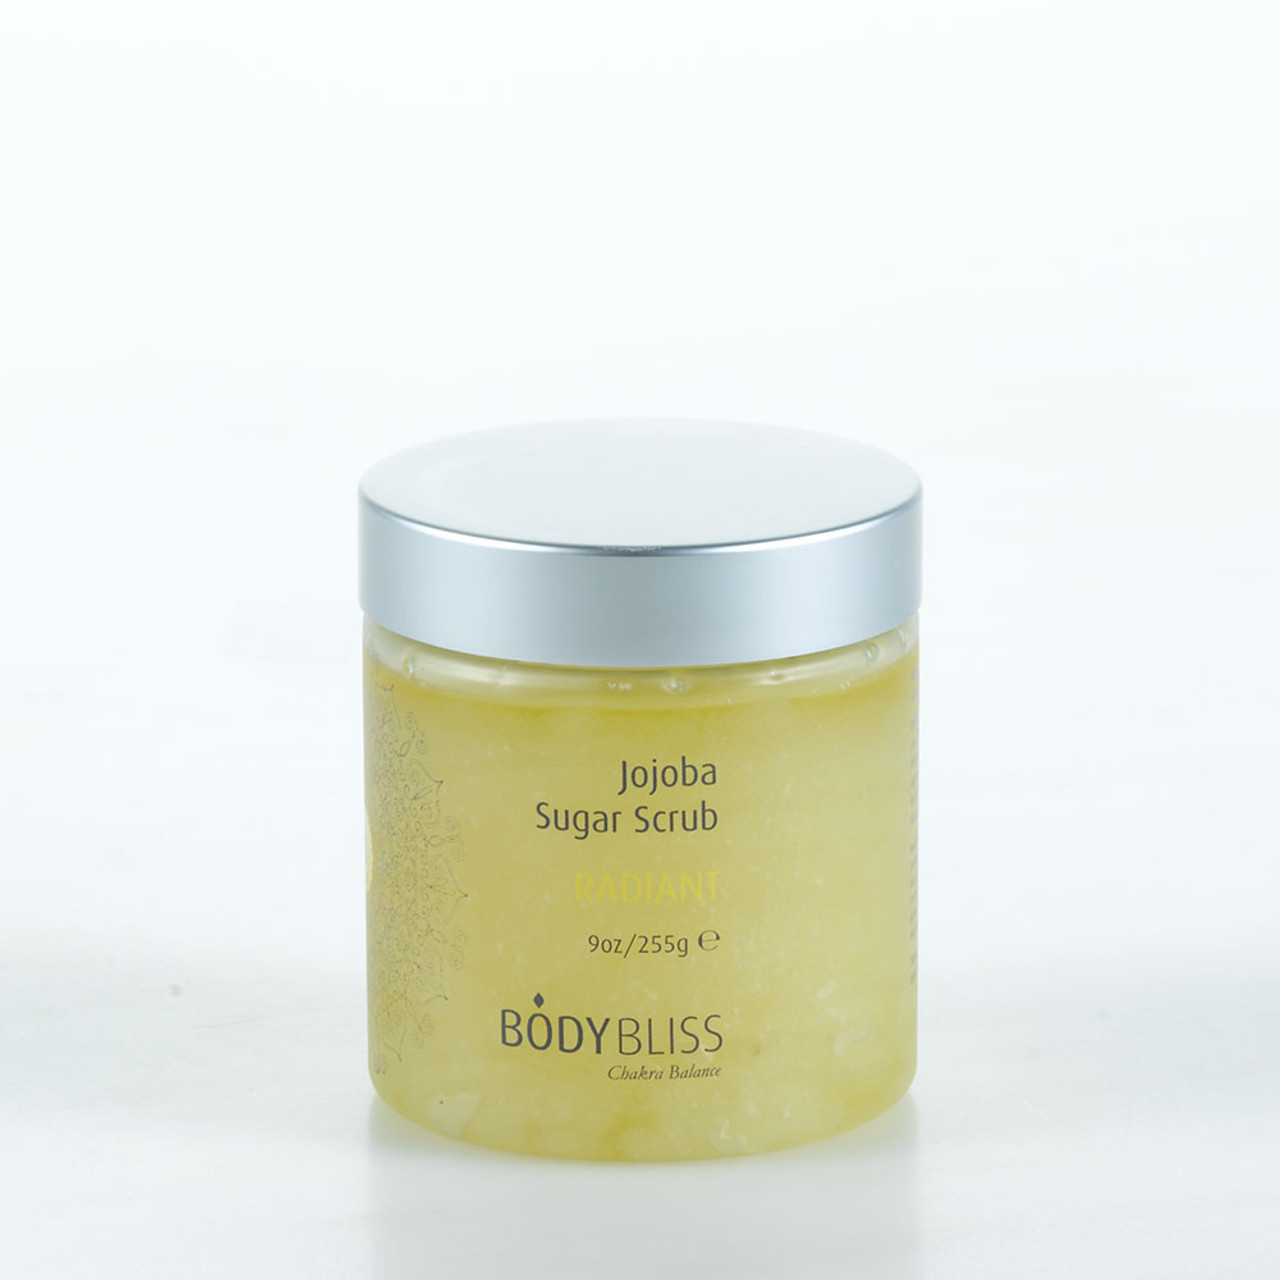 Organic Lemon & Amber Jojoba Sugar Scrub